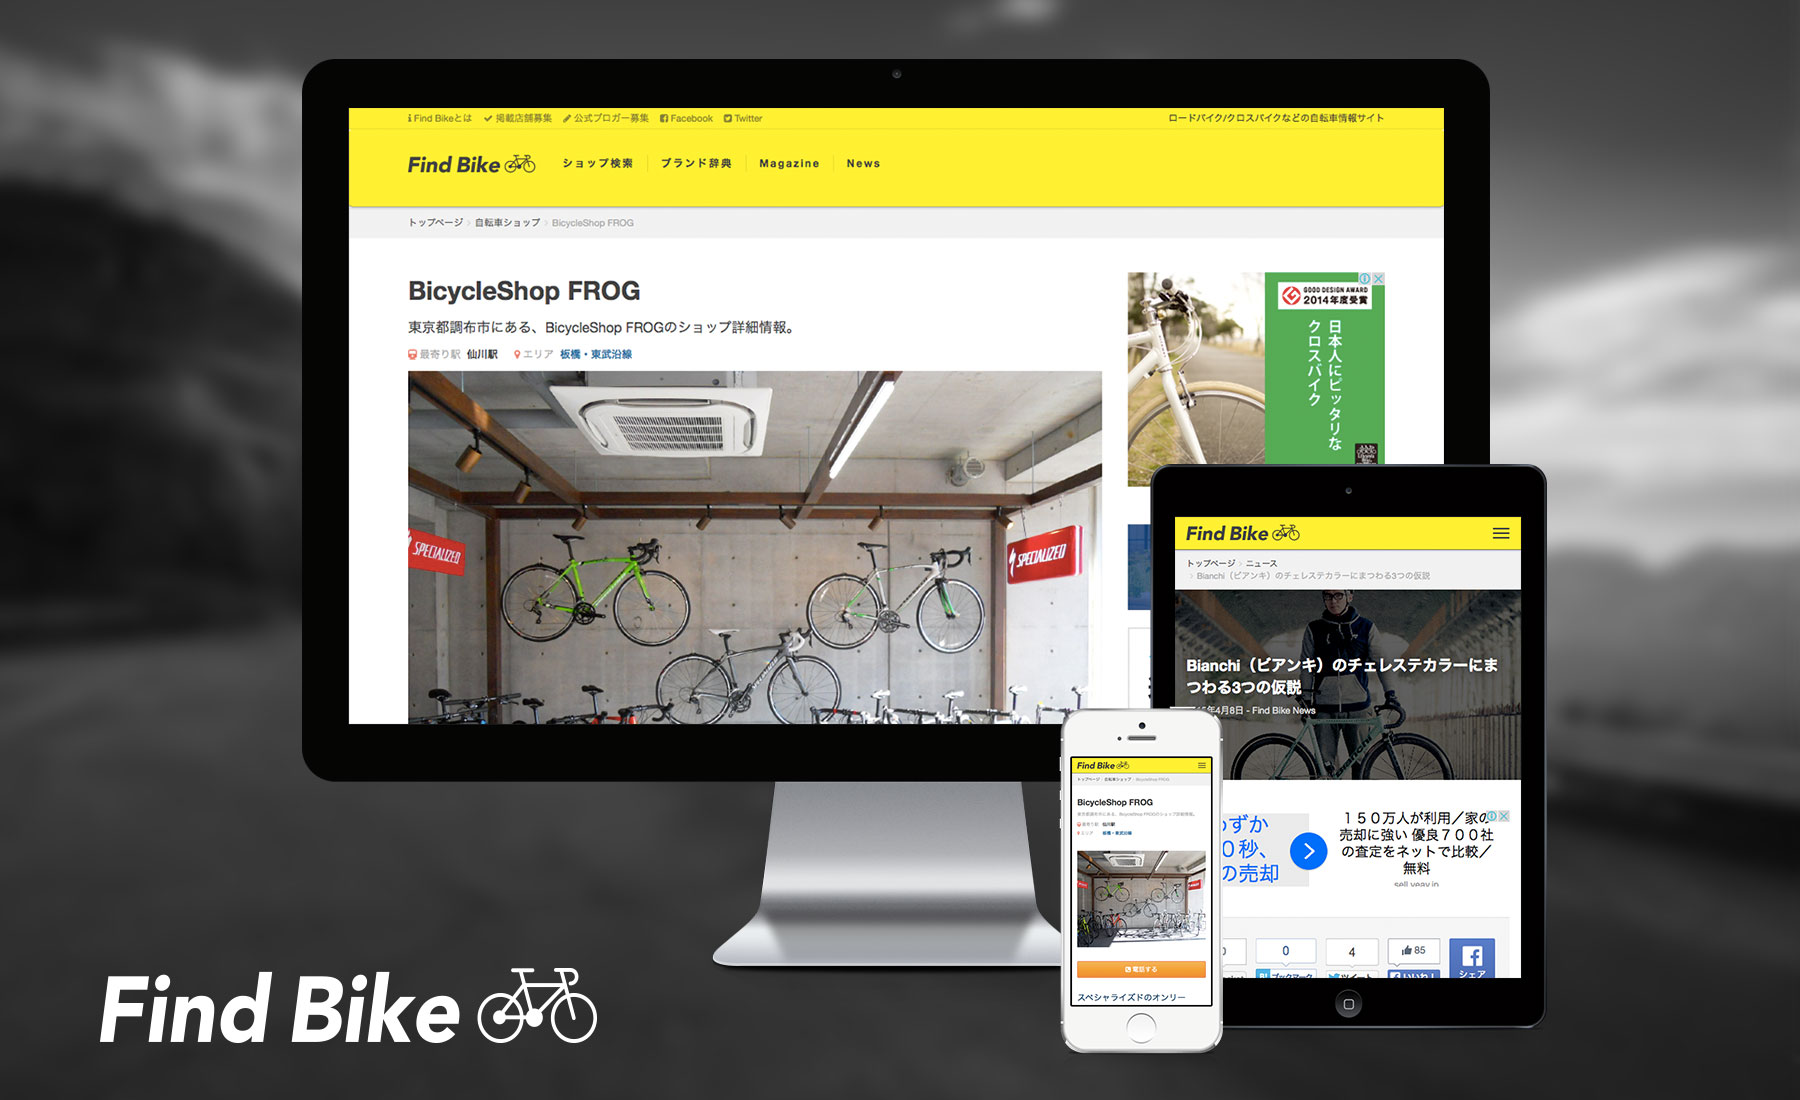 Find Bike